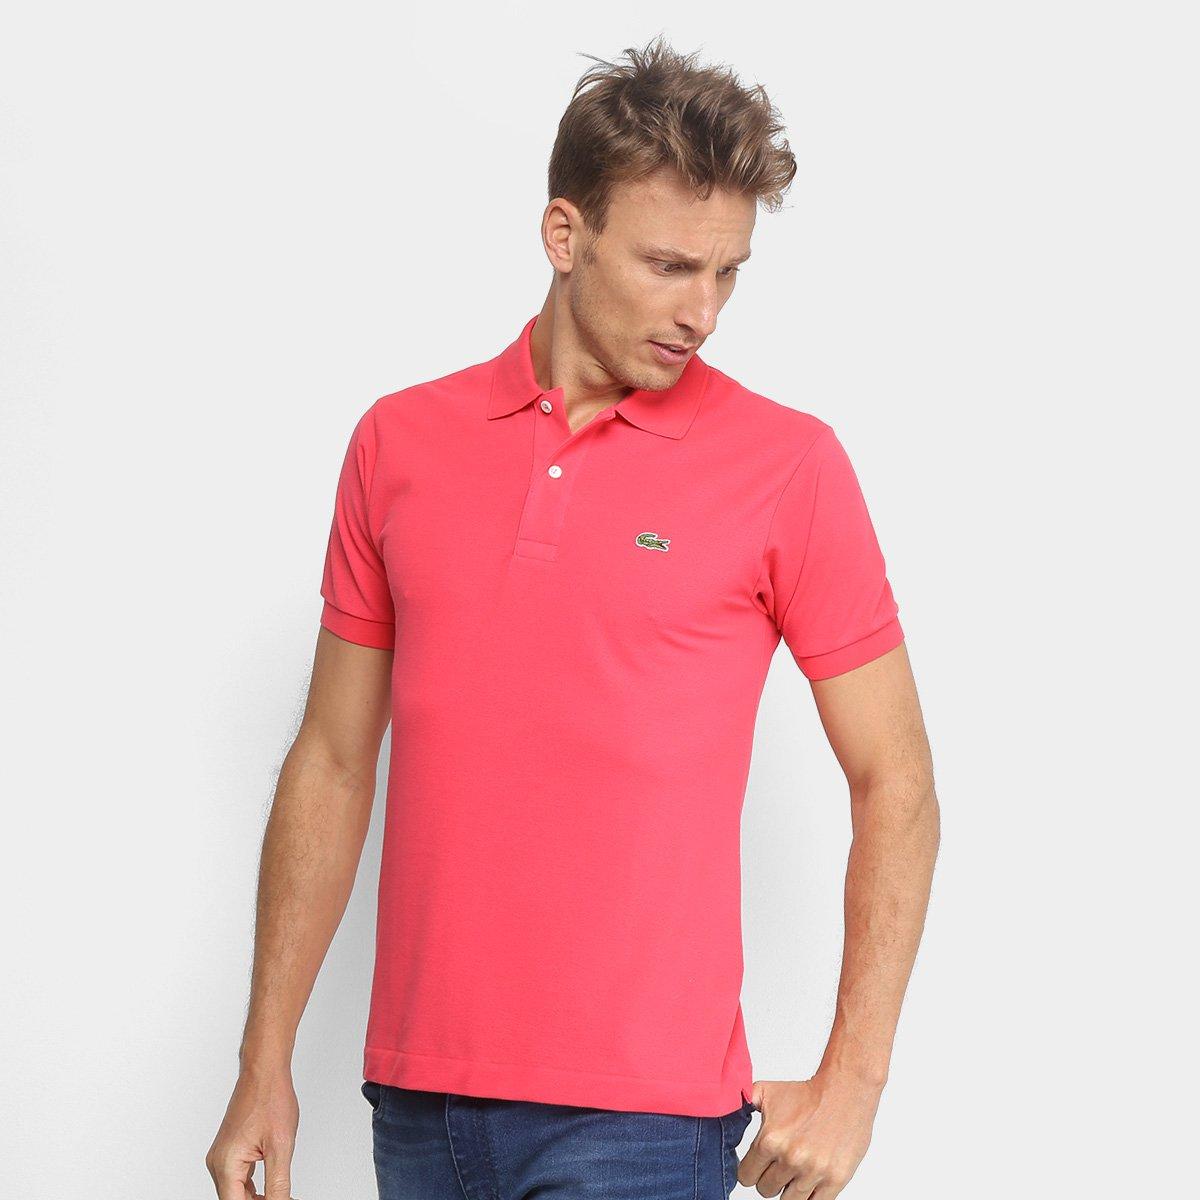 quality design 8d768 672a4 Camisa Polo Lacoste Piquet Original Masculina - Rosa